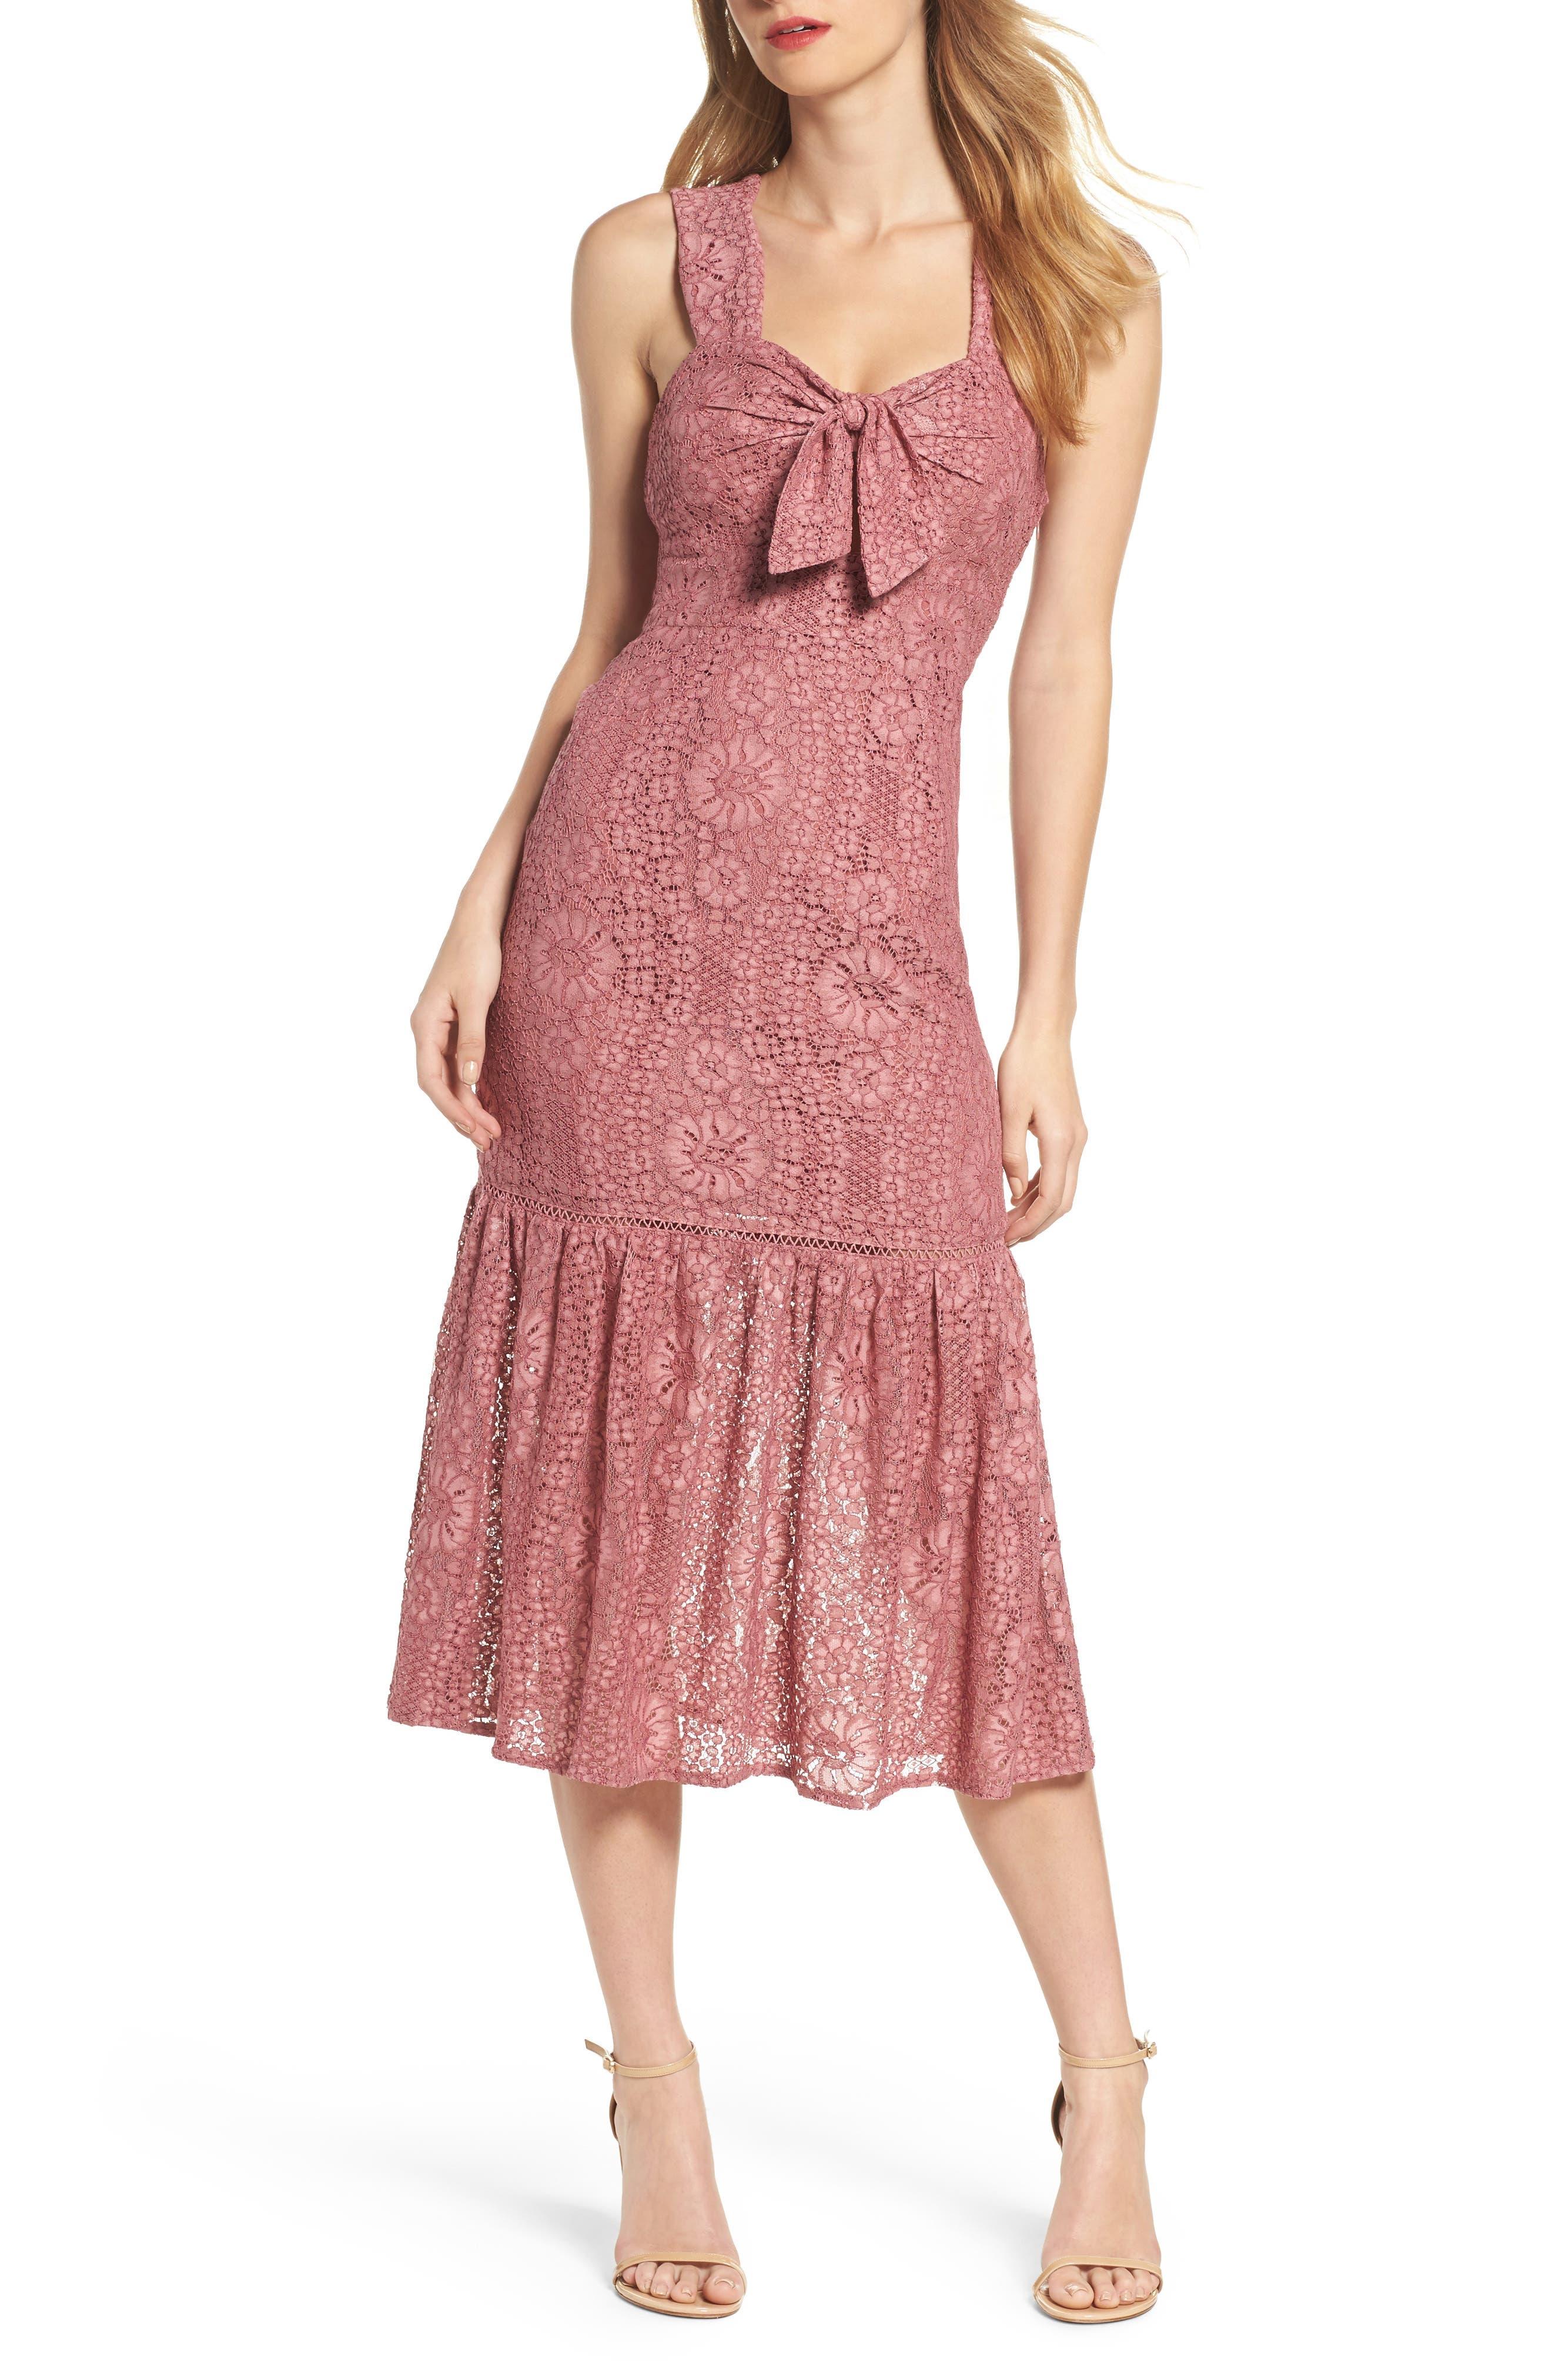 Foxiedox Emilia Lace Peplum Midi Dress